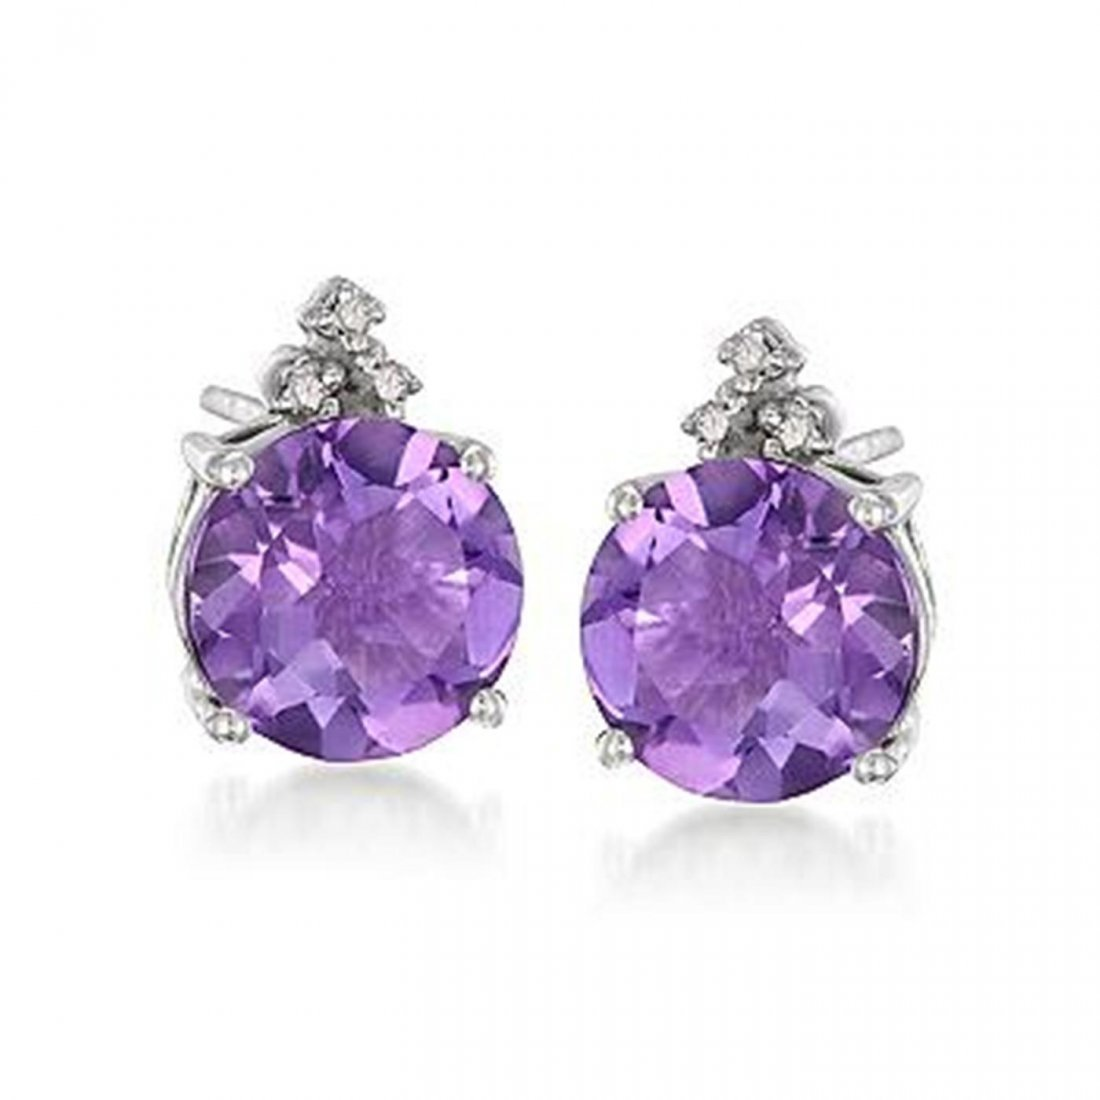 3.60 ct. t.w. Purple Amethyst and .10 ct. t.w. Diamond